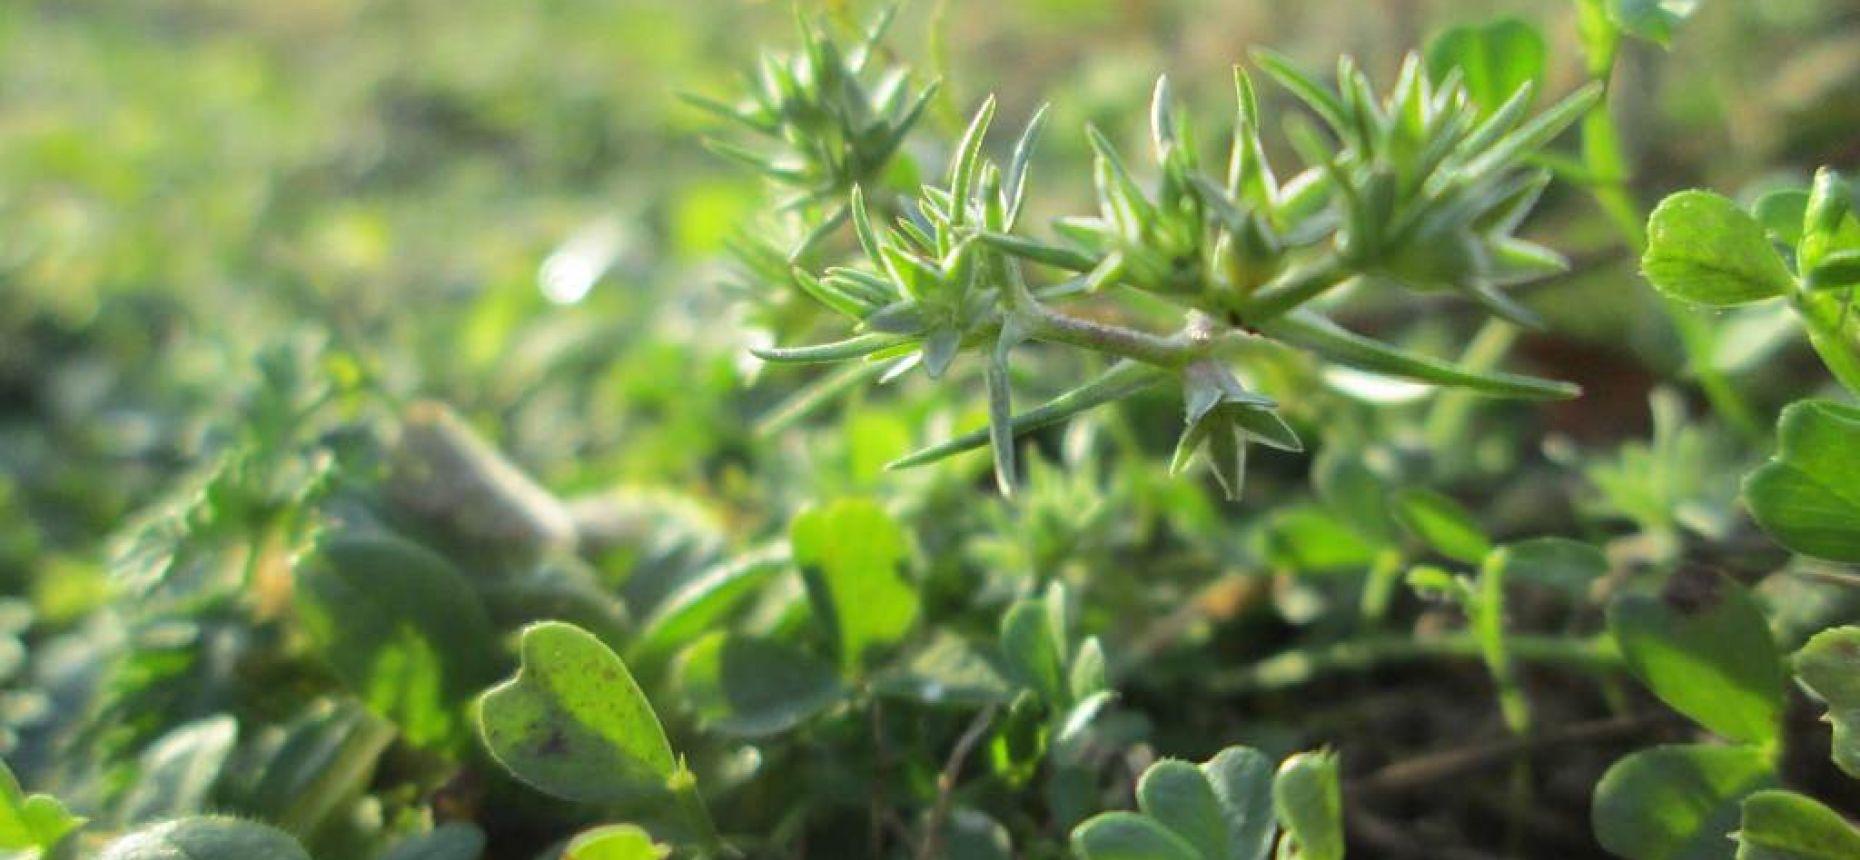 Scleranthus annuus L. - Дивала однолетняя